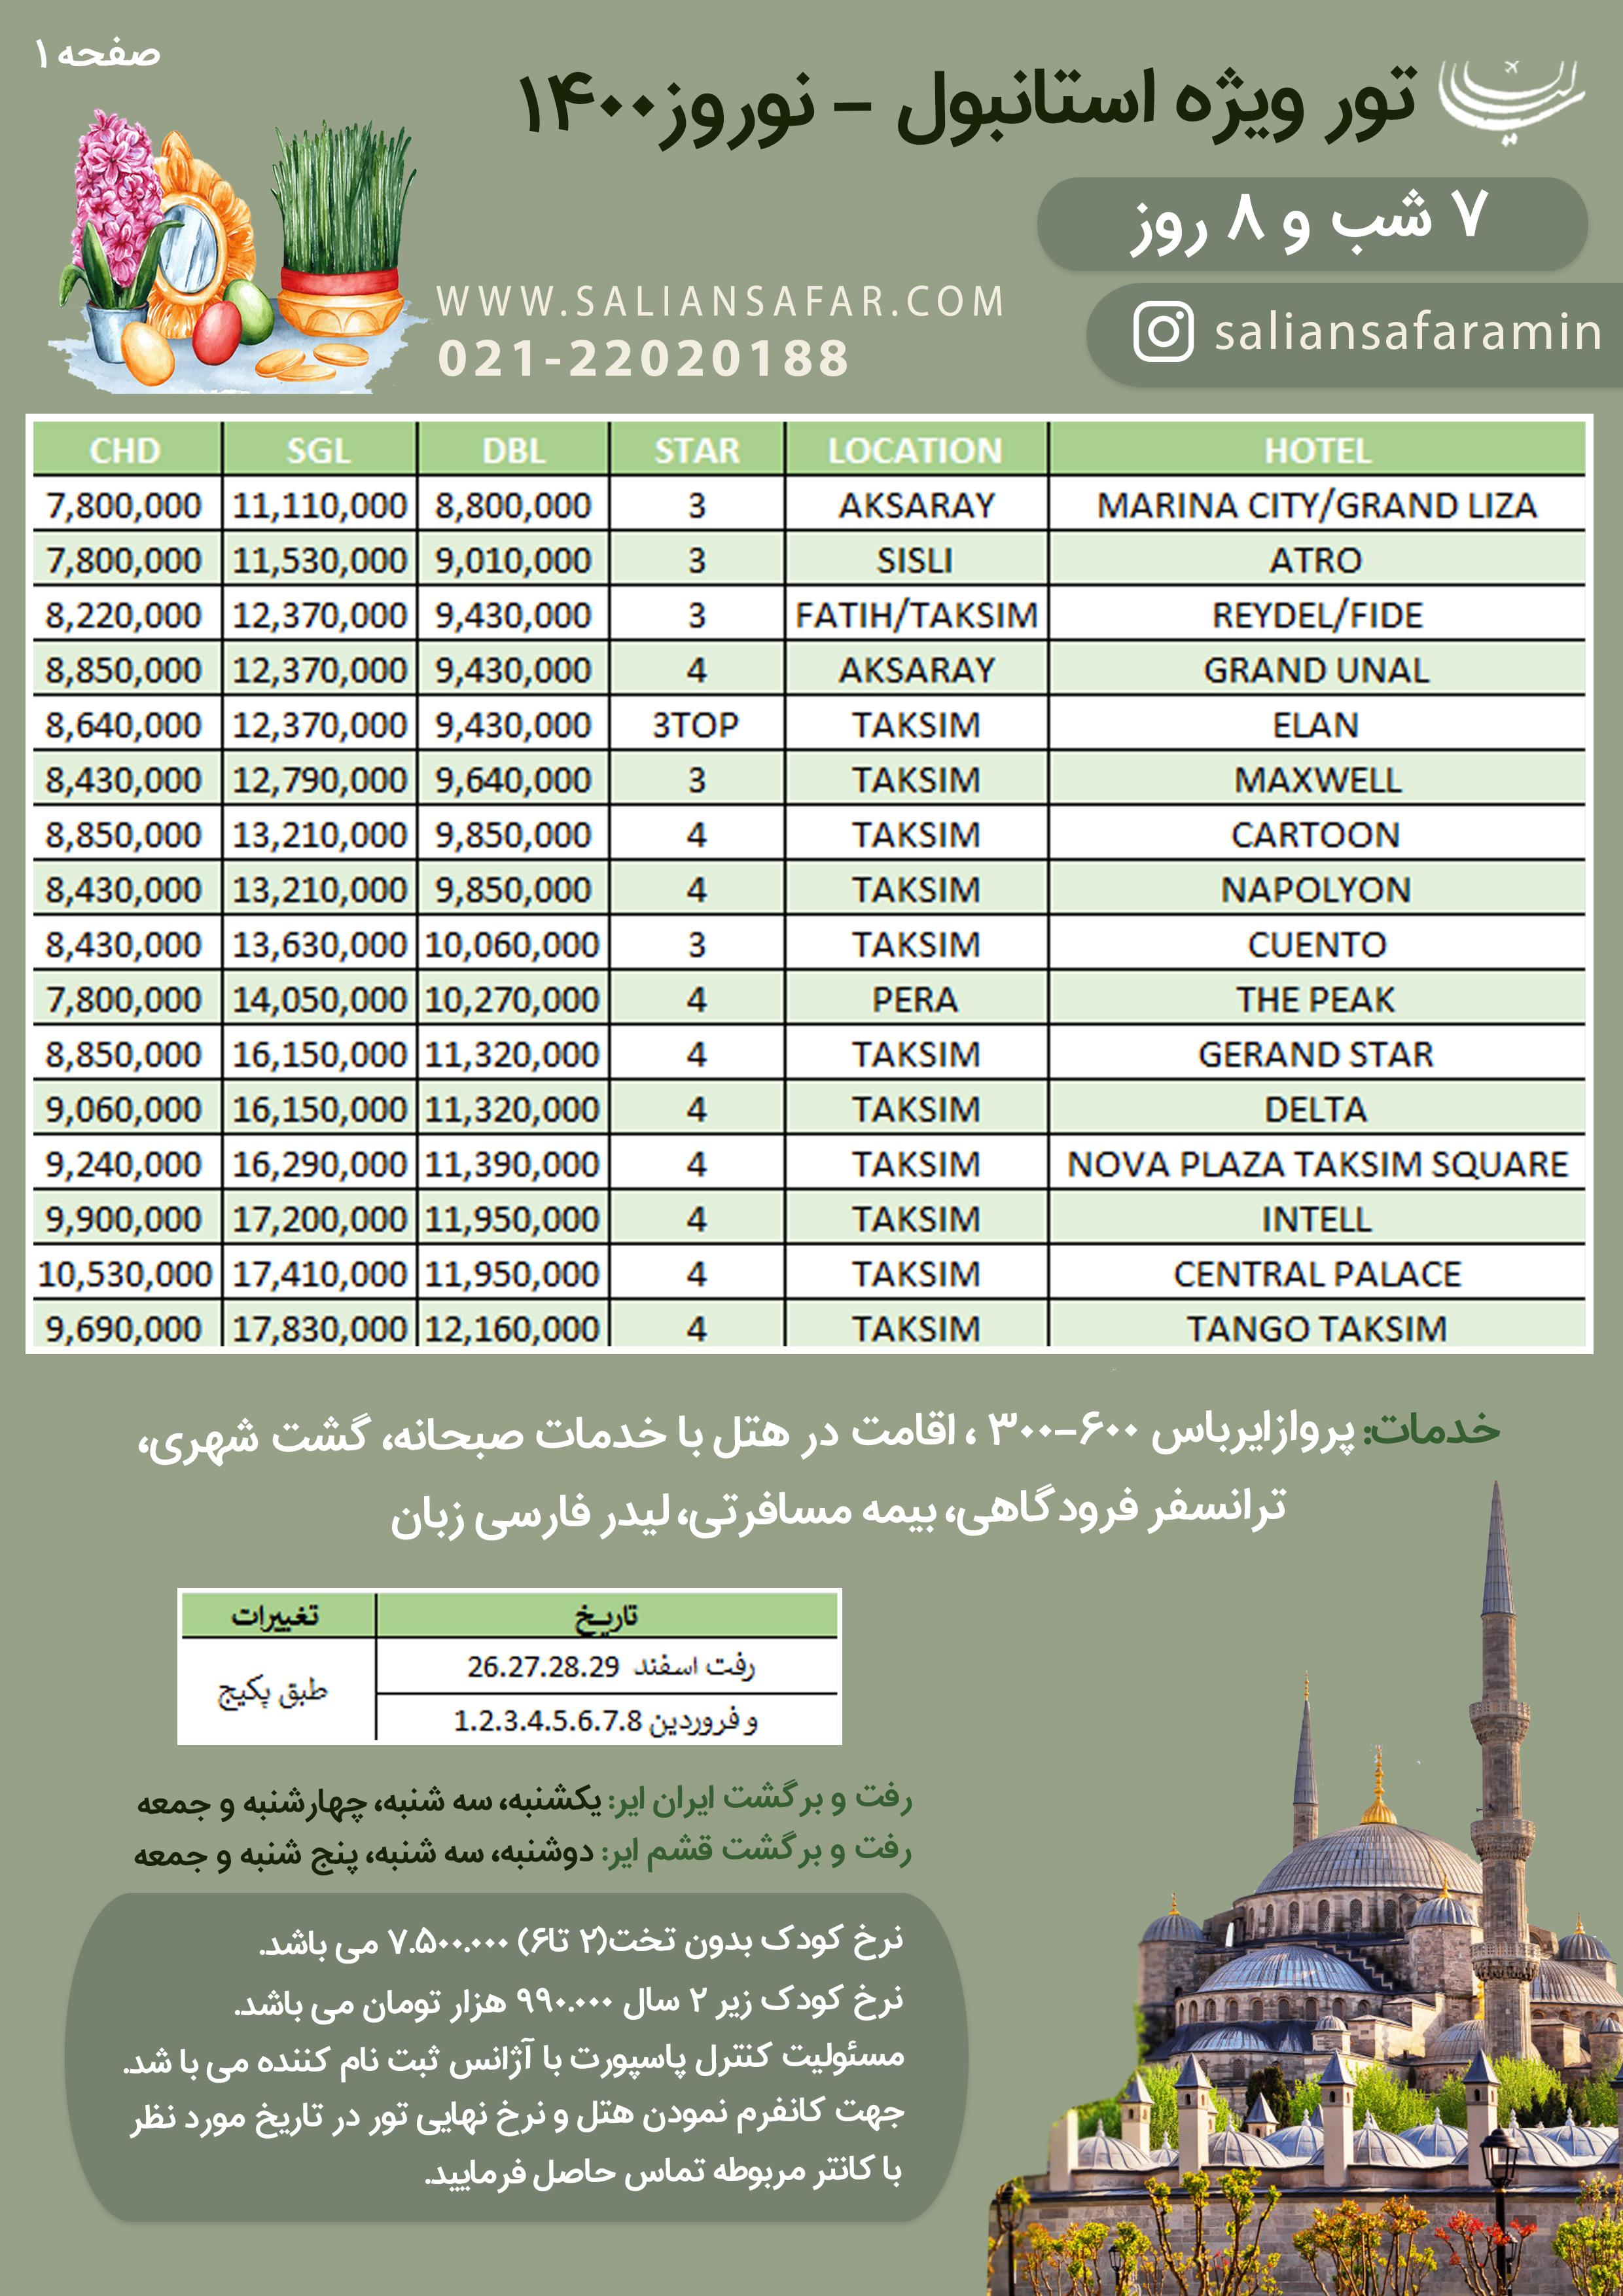 تور استانبول 7 شب و 8 روز ویژه نوروز 1400